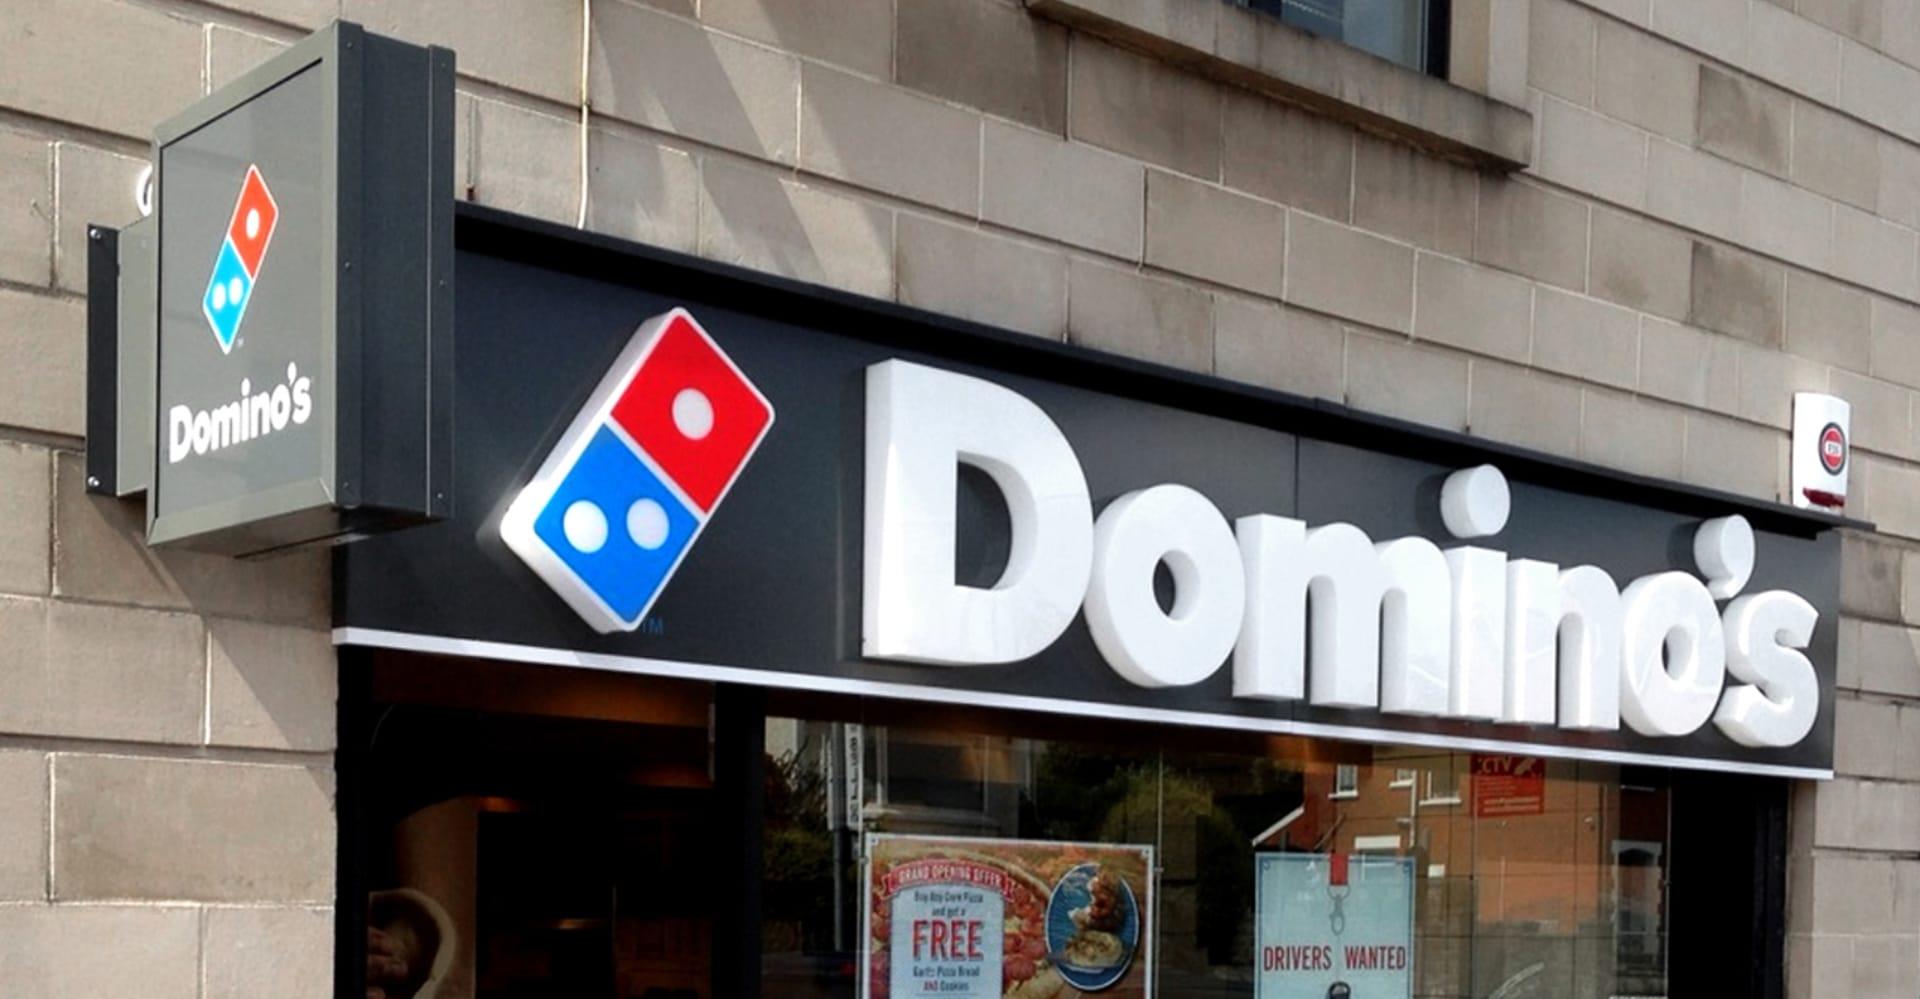 Domino's on Saintfield Road